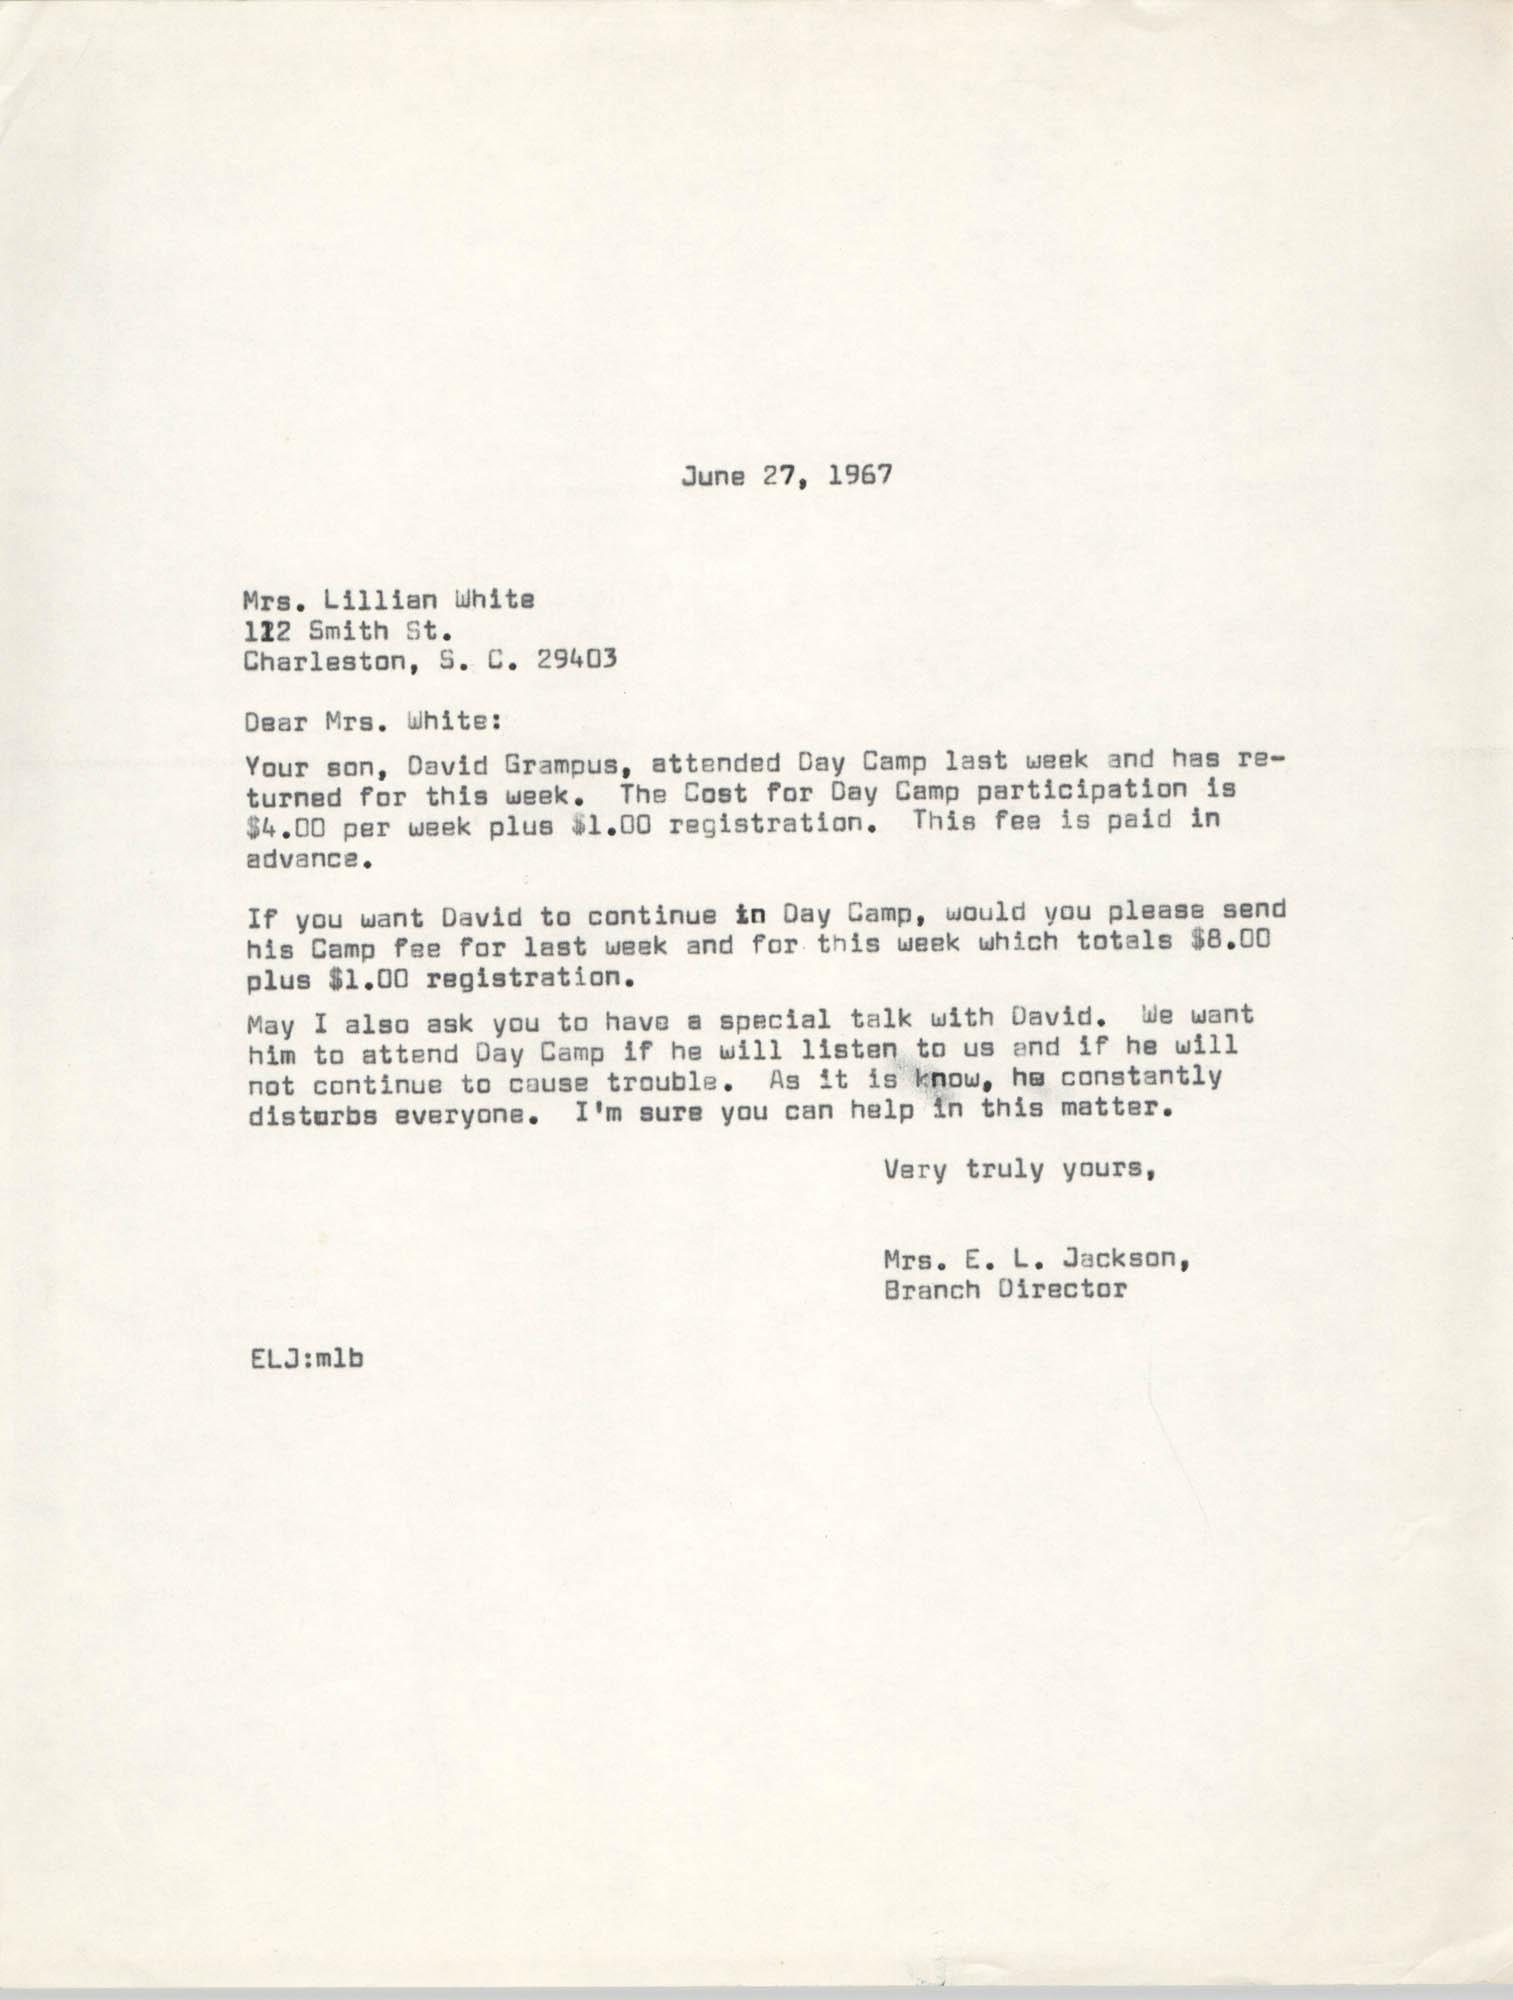 Letter from Christine O. Jackson to Lillian White, June 27, 1967